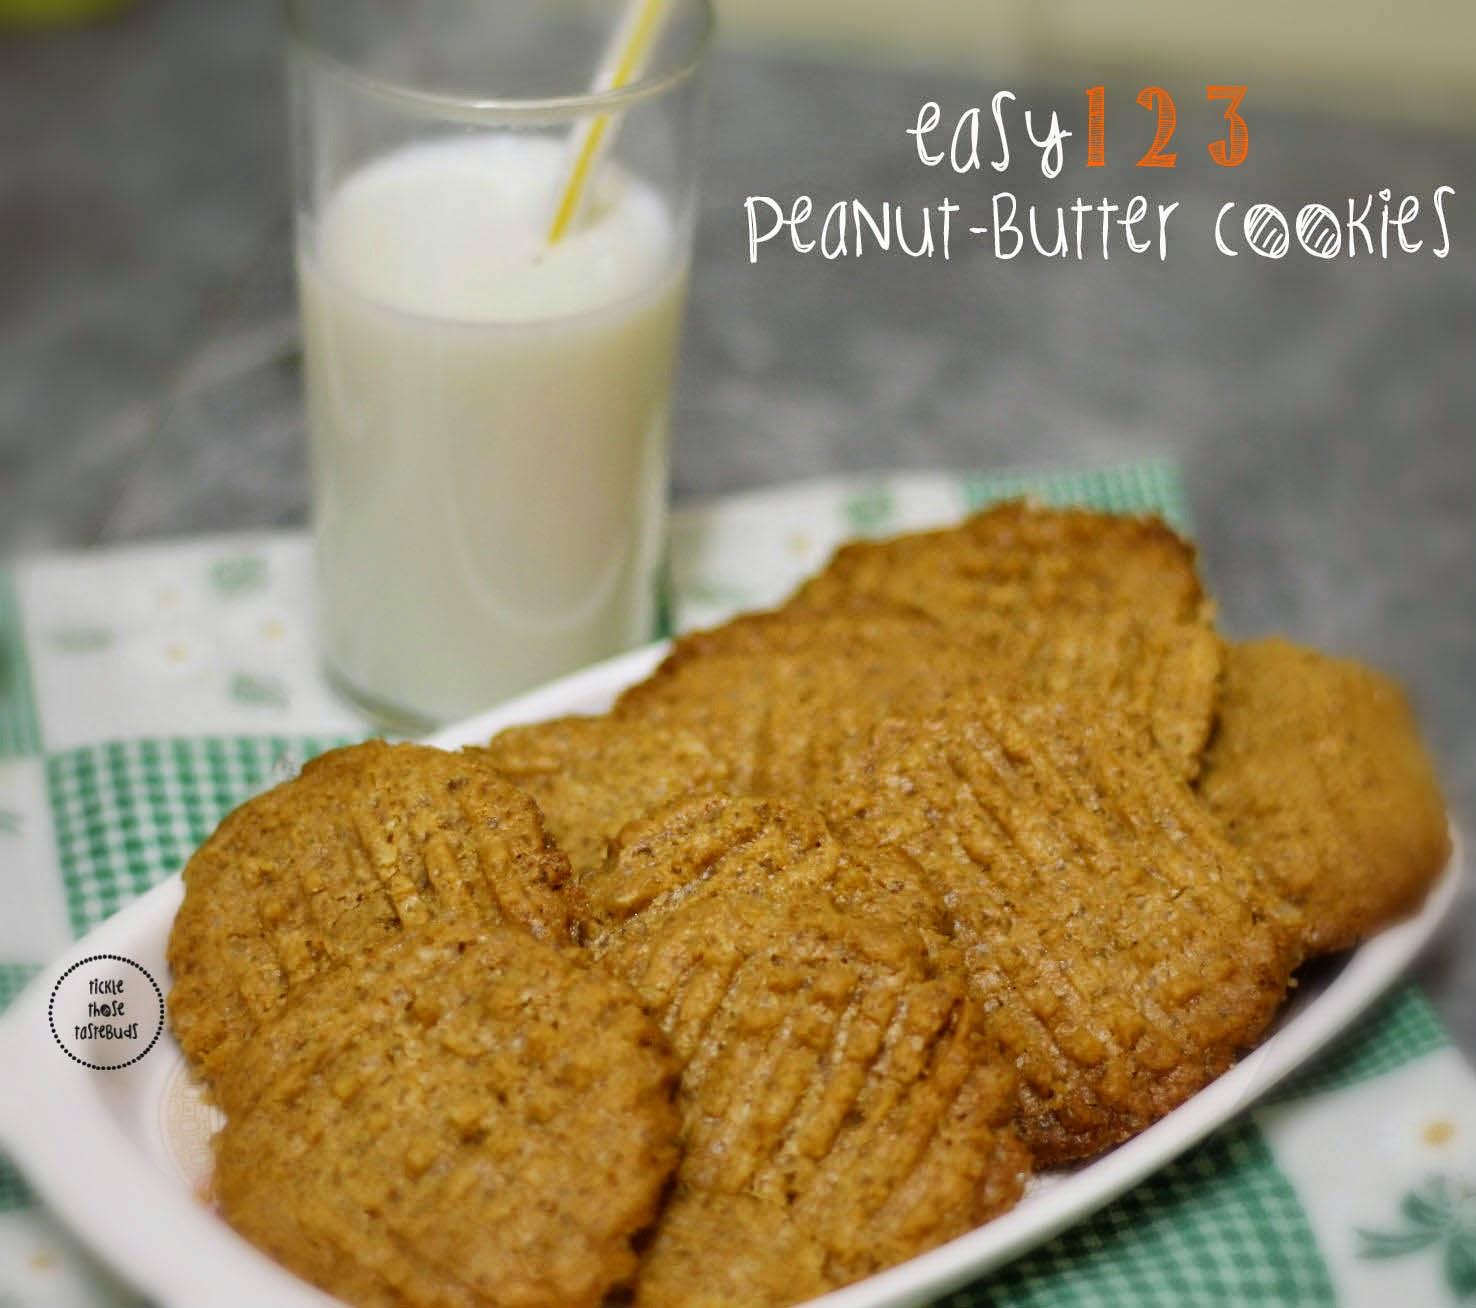 Easy-Peanut-Butter-Cookies-Ticklethosetastebuds